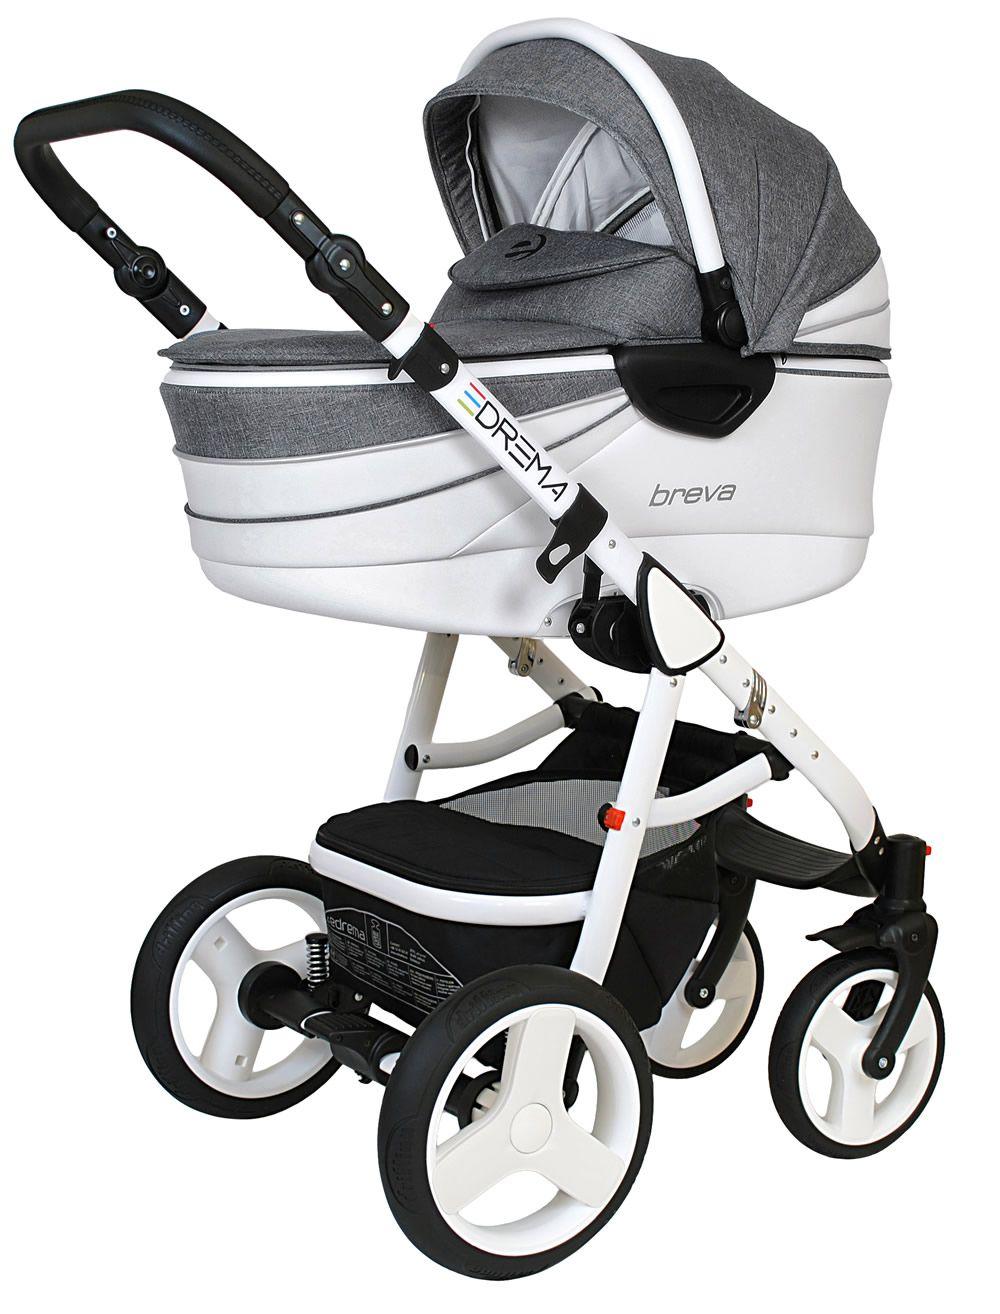 Breva Premium Kombi-Kinderwagen 3 in 1 mit Babyschale   BP1-breva-prem 66a8f19845